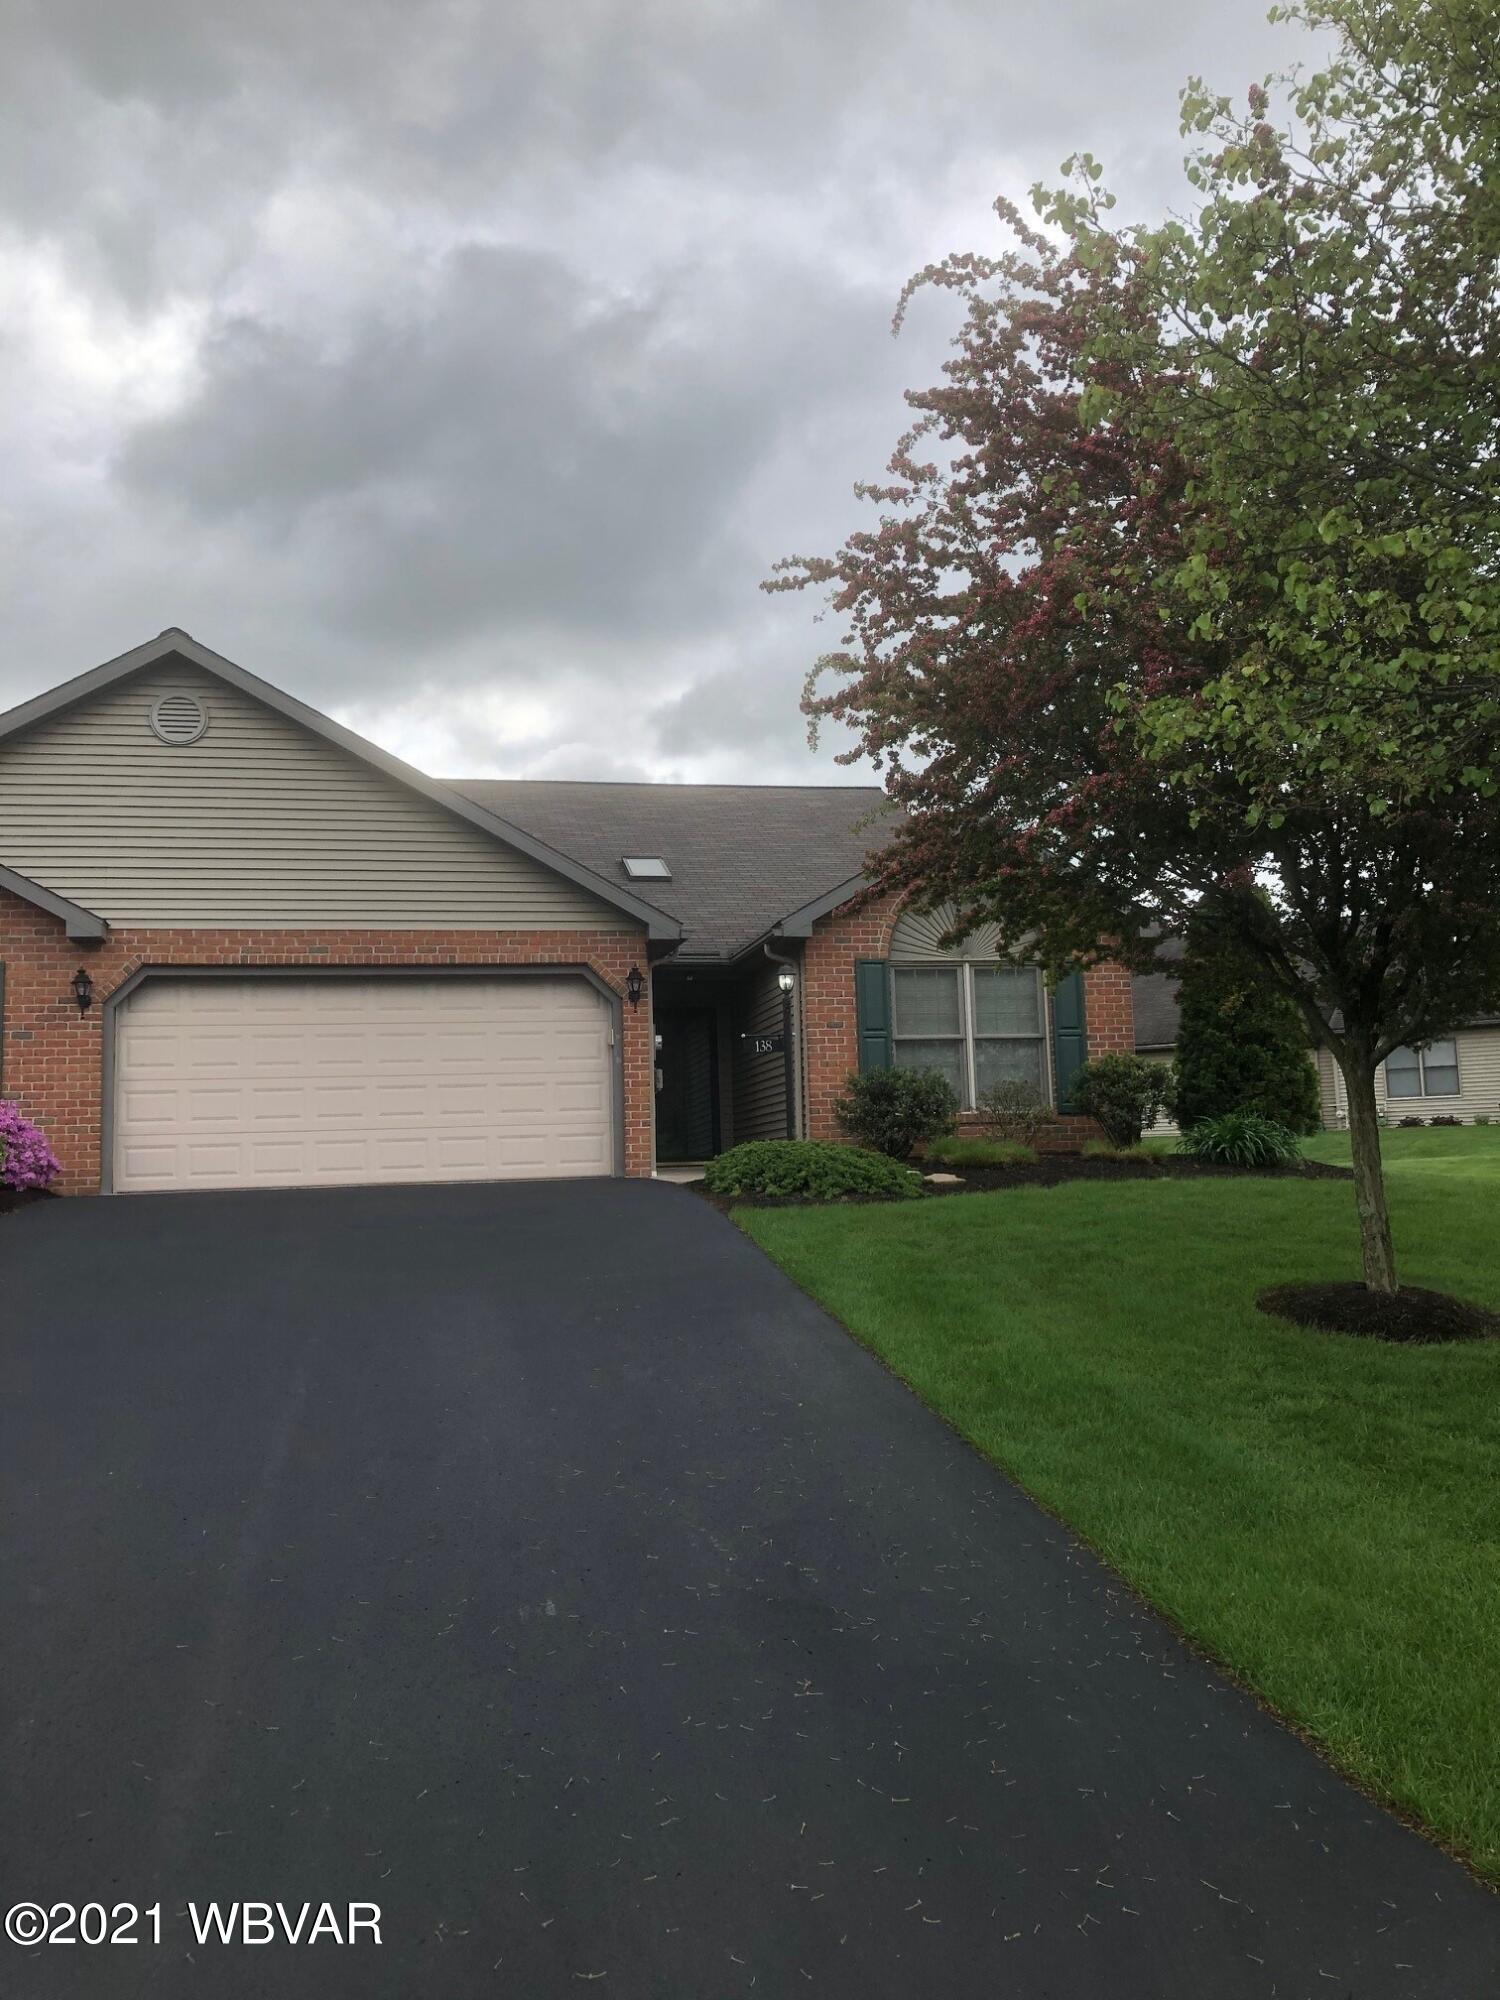 138 WOODSEDGE DRIVE, Milton, PA 17847, 2 Bedrooms Bedrooms, ,2 BathroomsBathrooms,Residential,For sale,WOODSEDGE,WB-92492